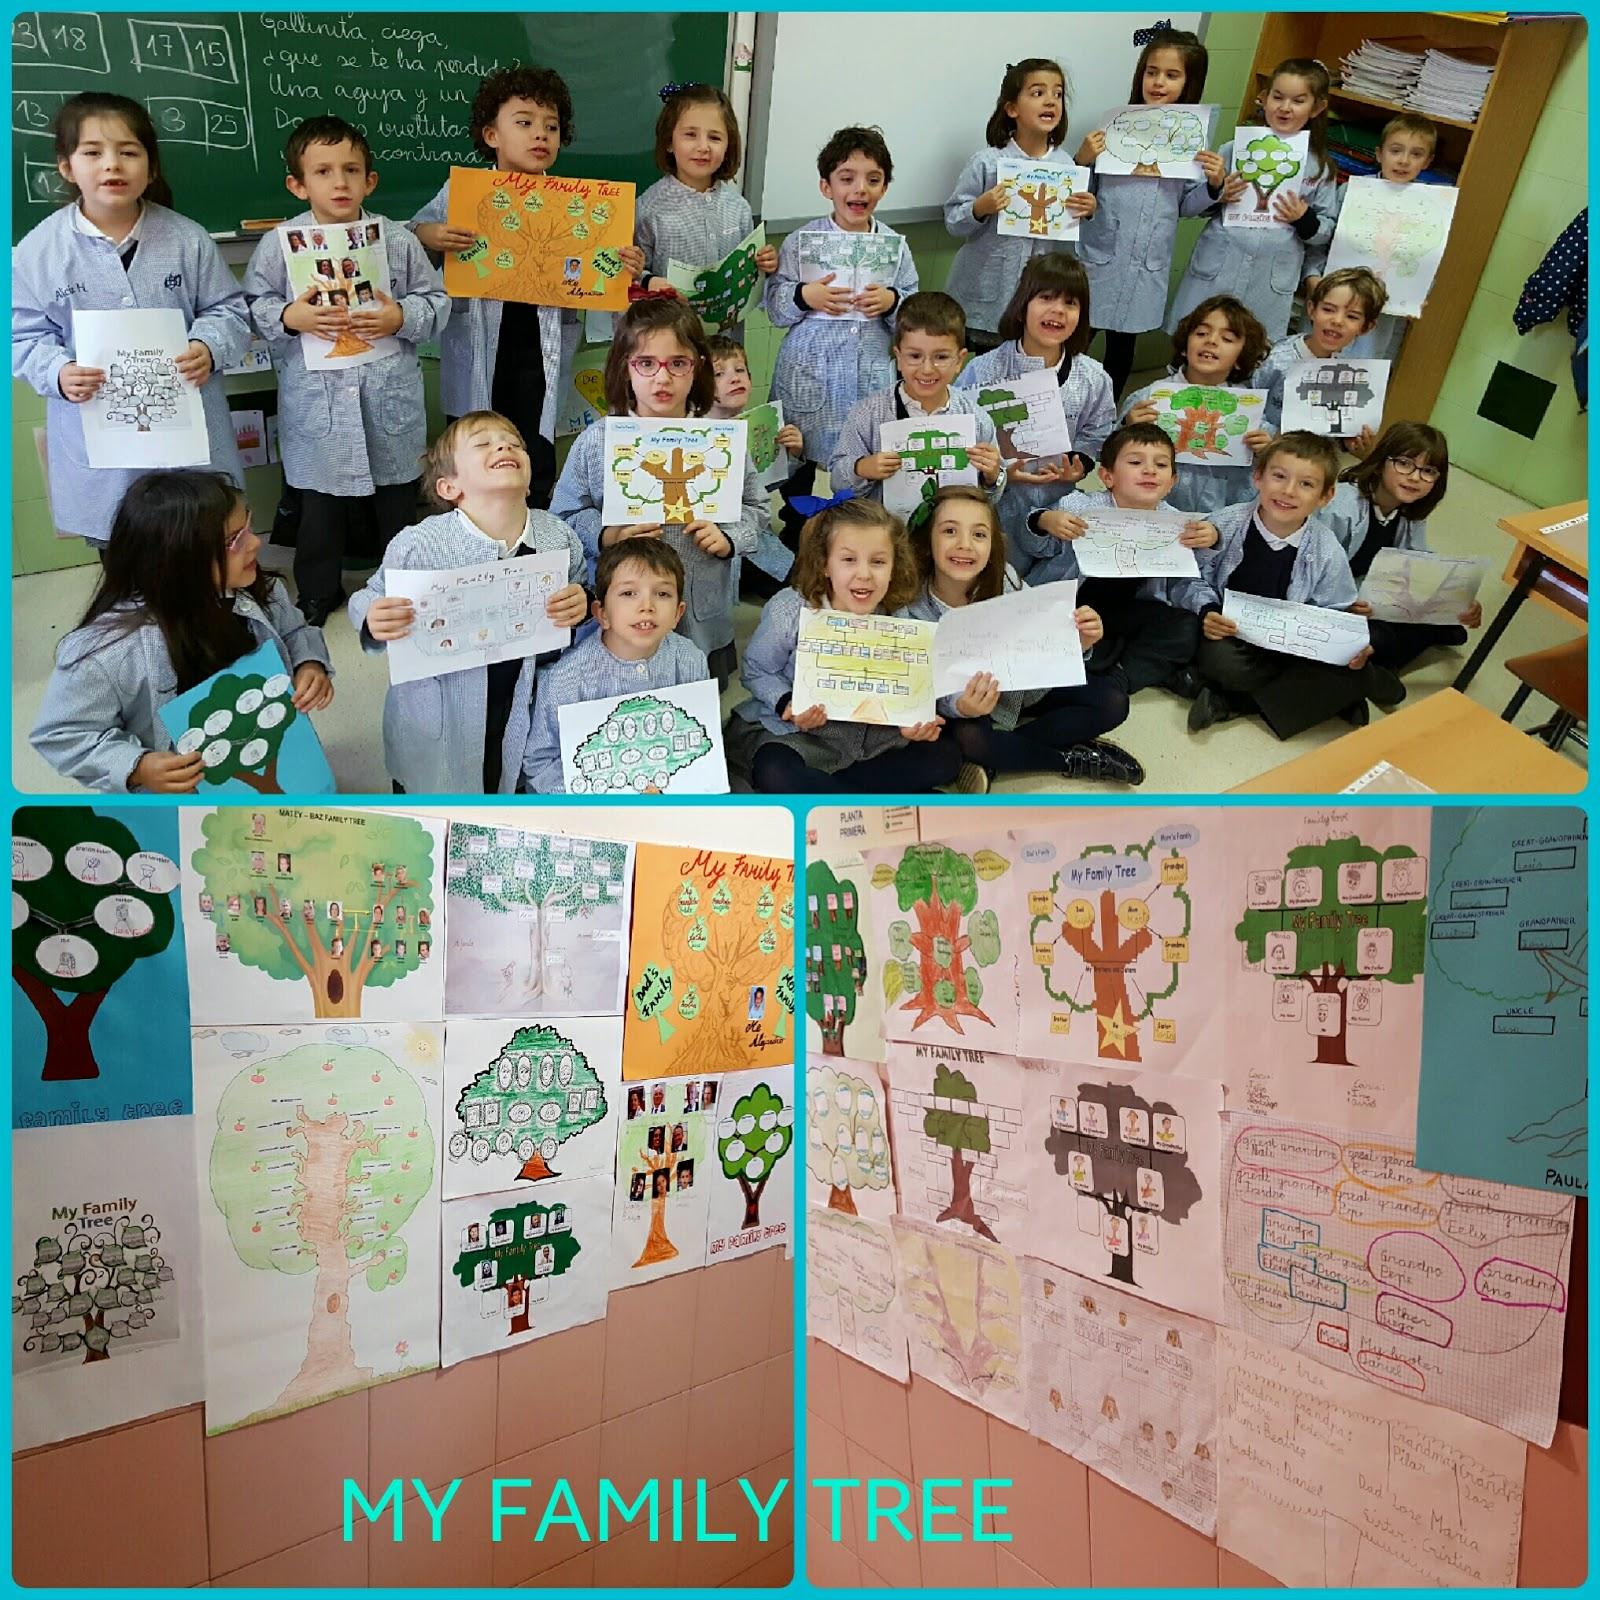 Agustinas Valladolid - 2017 - Primaria 1 - My Family Tree 3